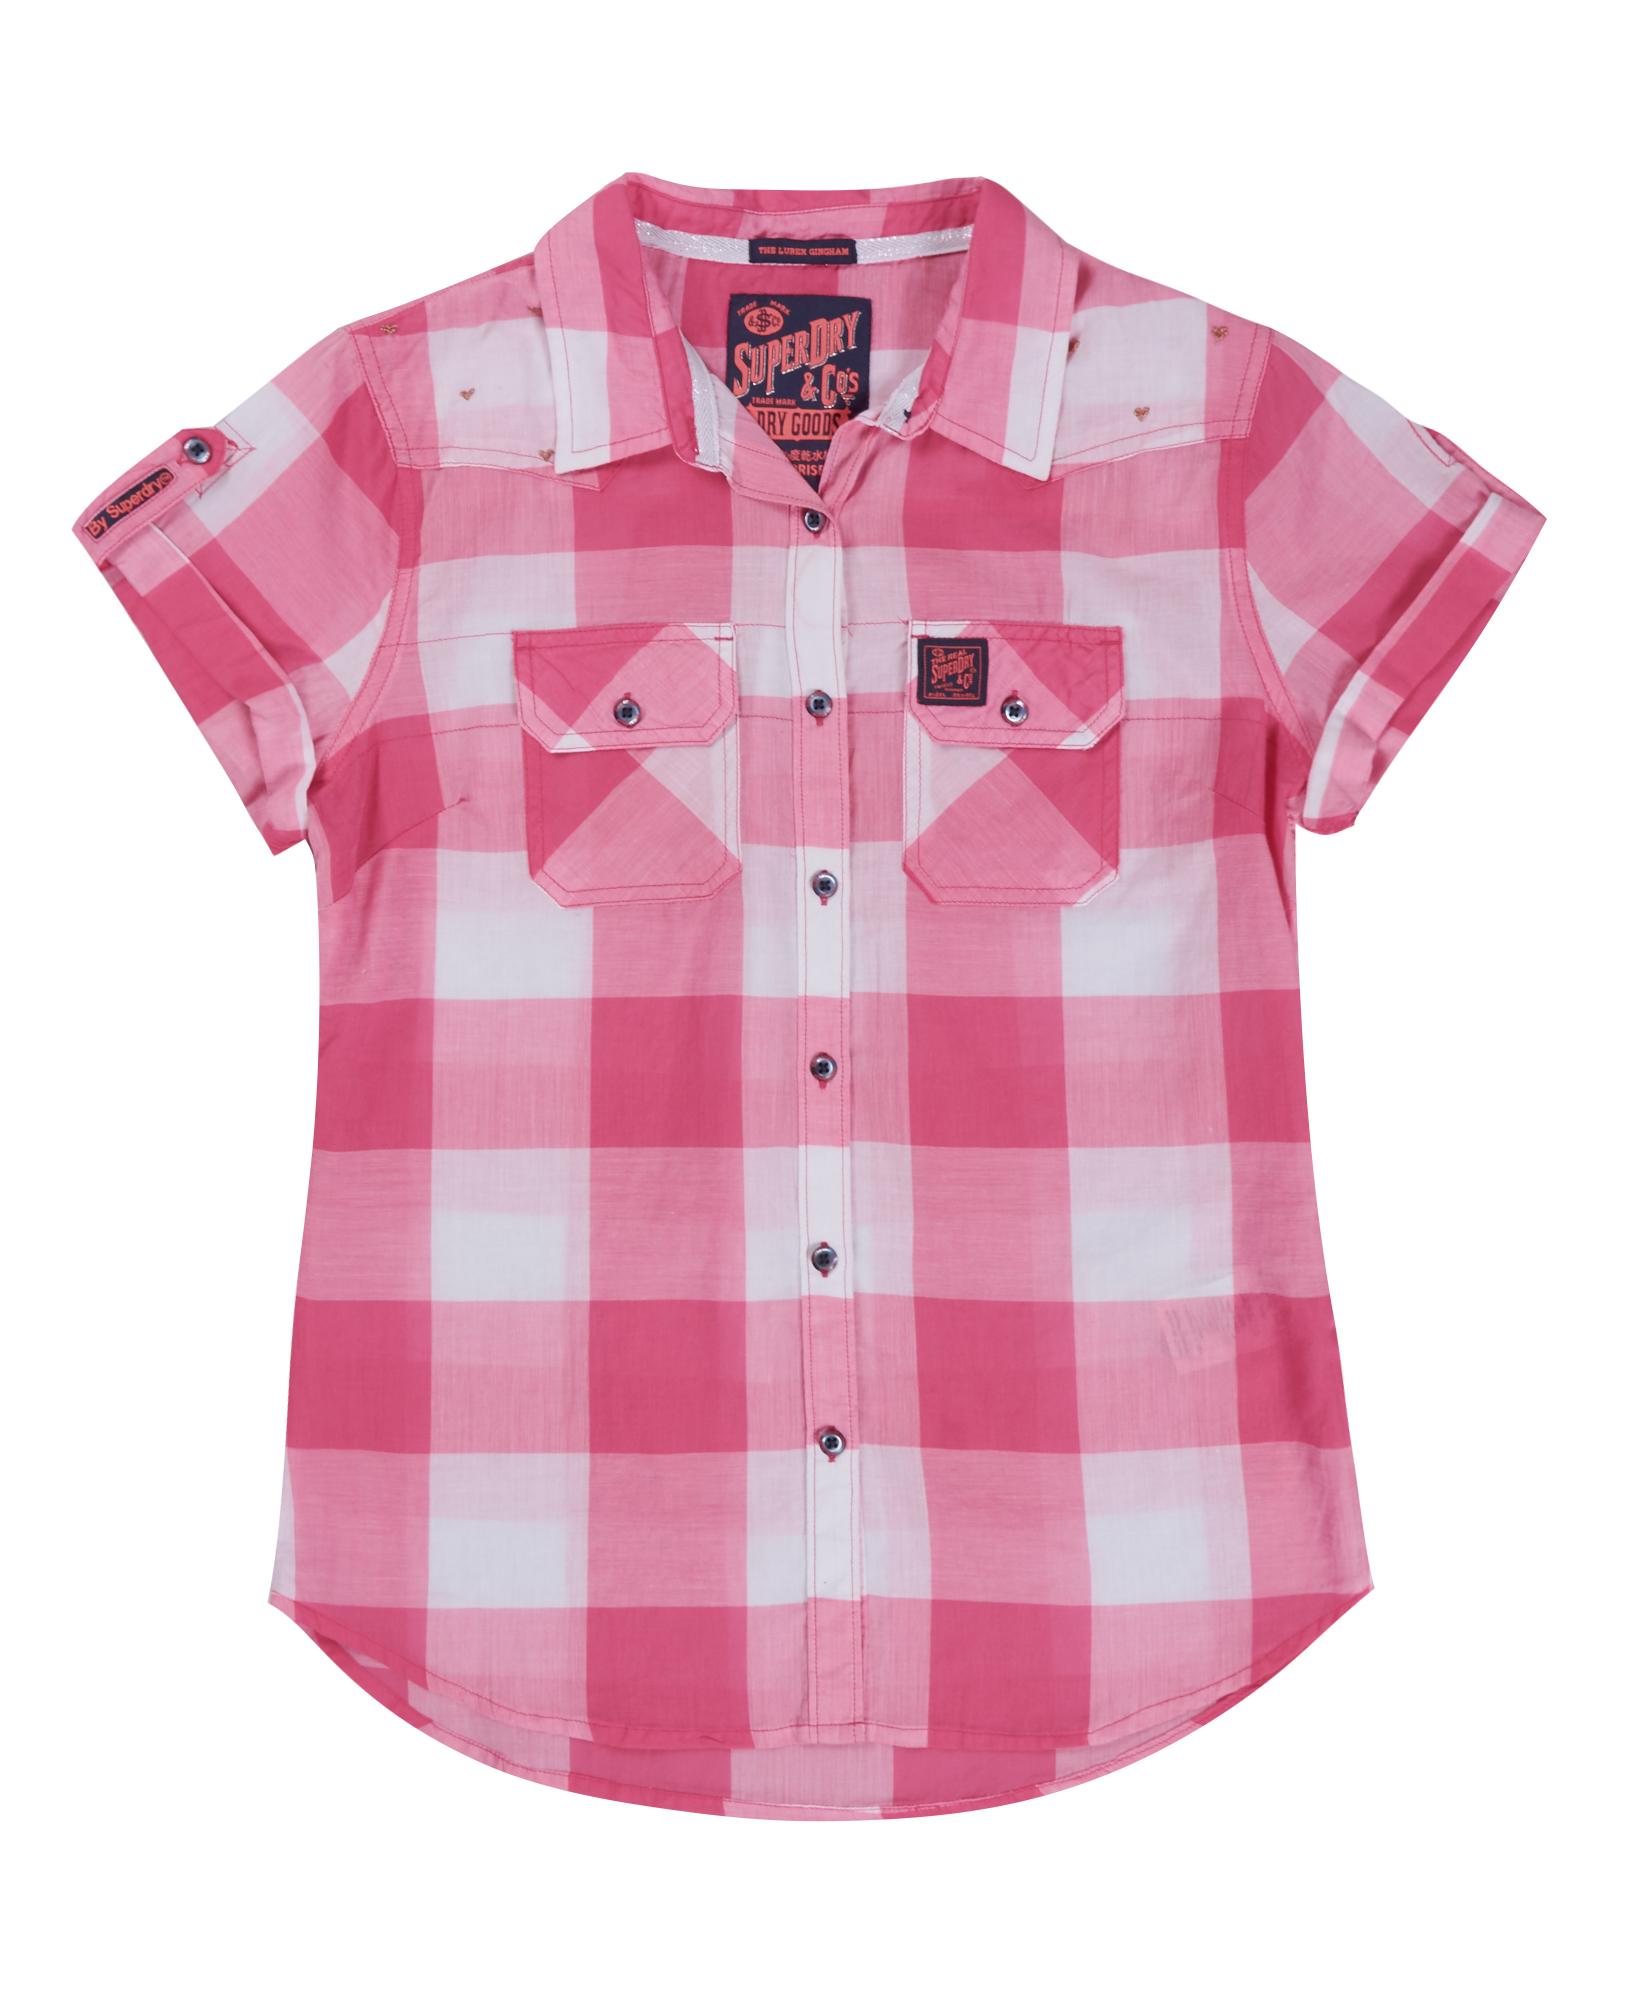 New womens superdry lurex gingham calamity shirt pink ebay for Pink gingham shirt ladies